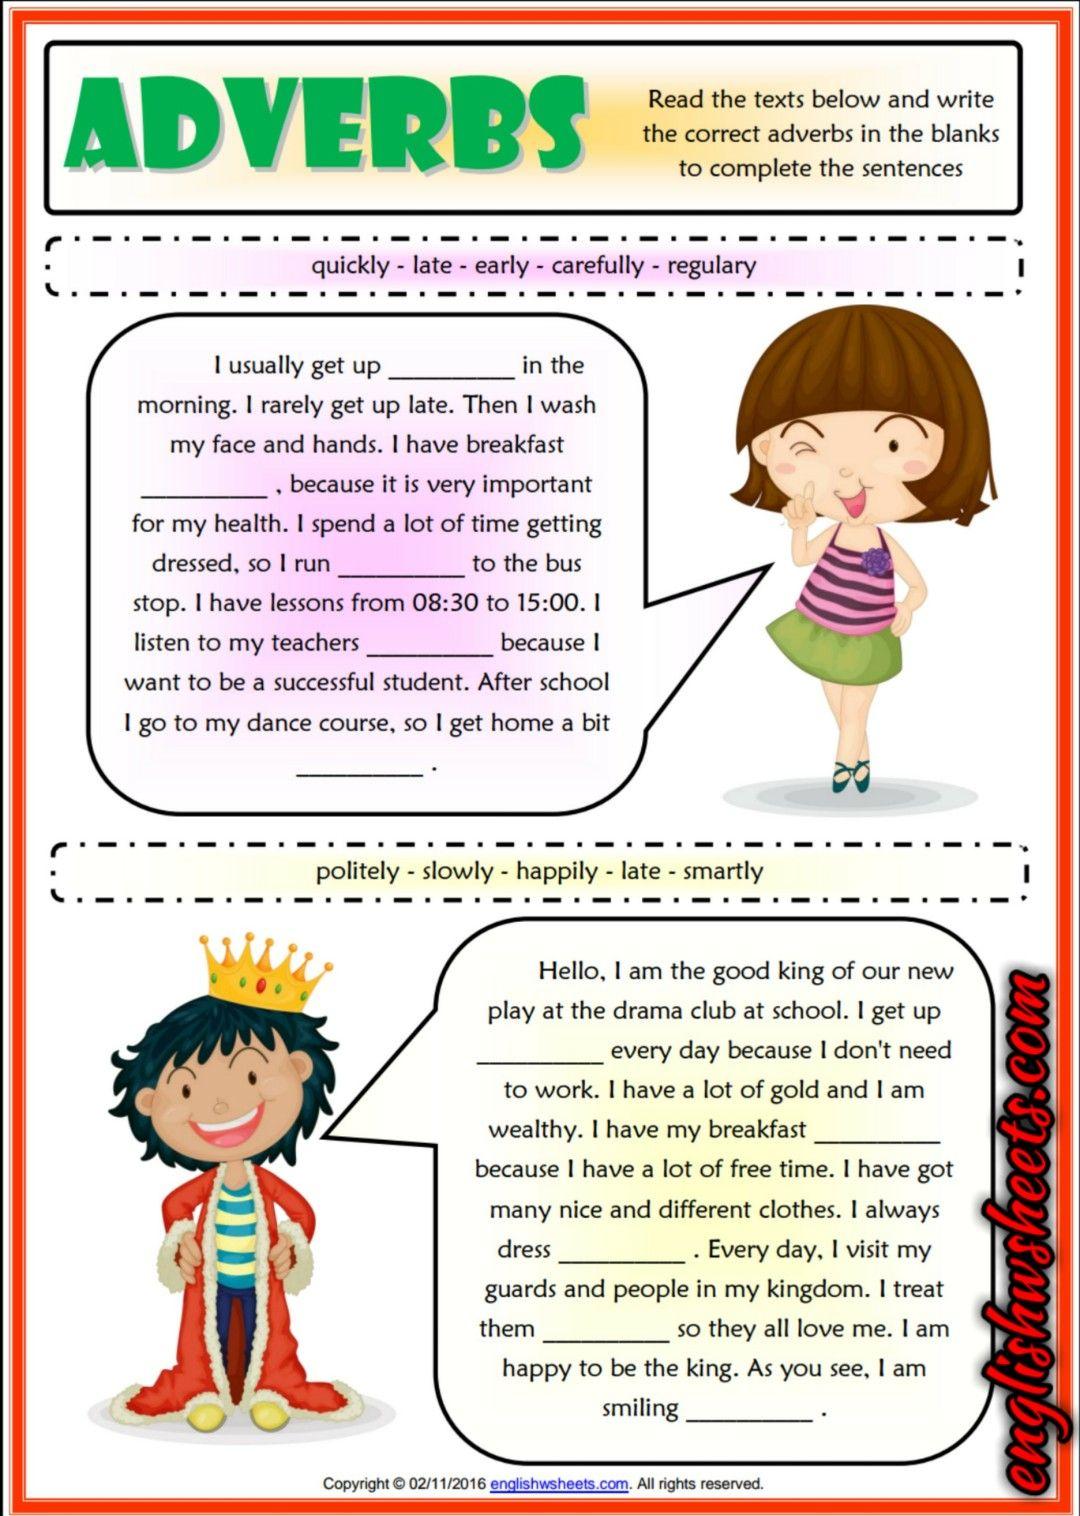 Adverbs Gap Fill ESL Grammar Exercises Test For Kids | Esl Printable ...